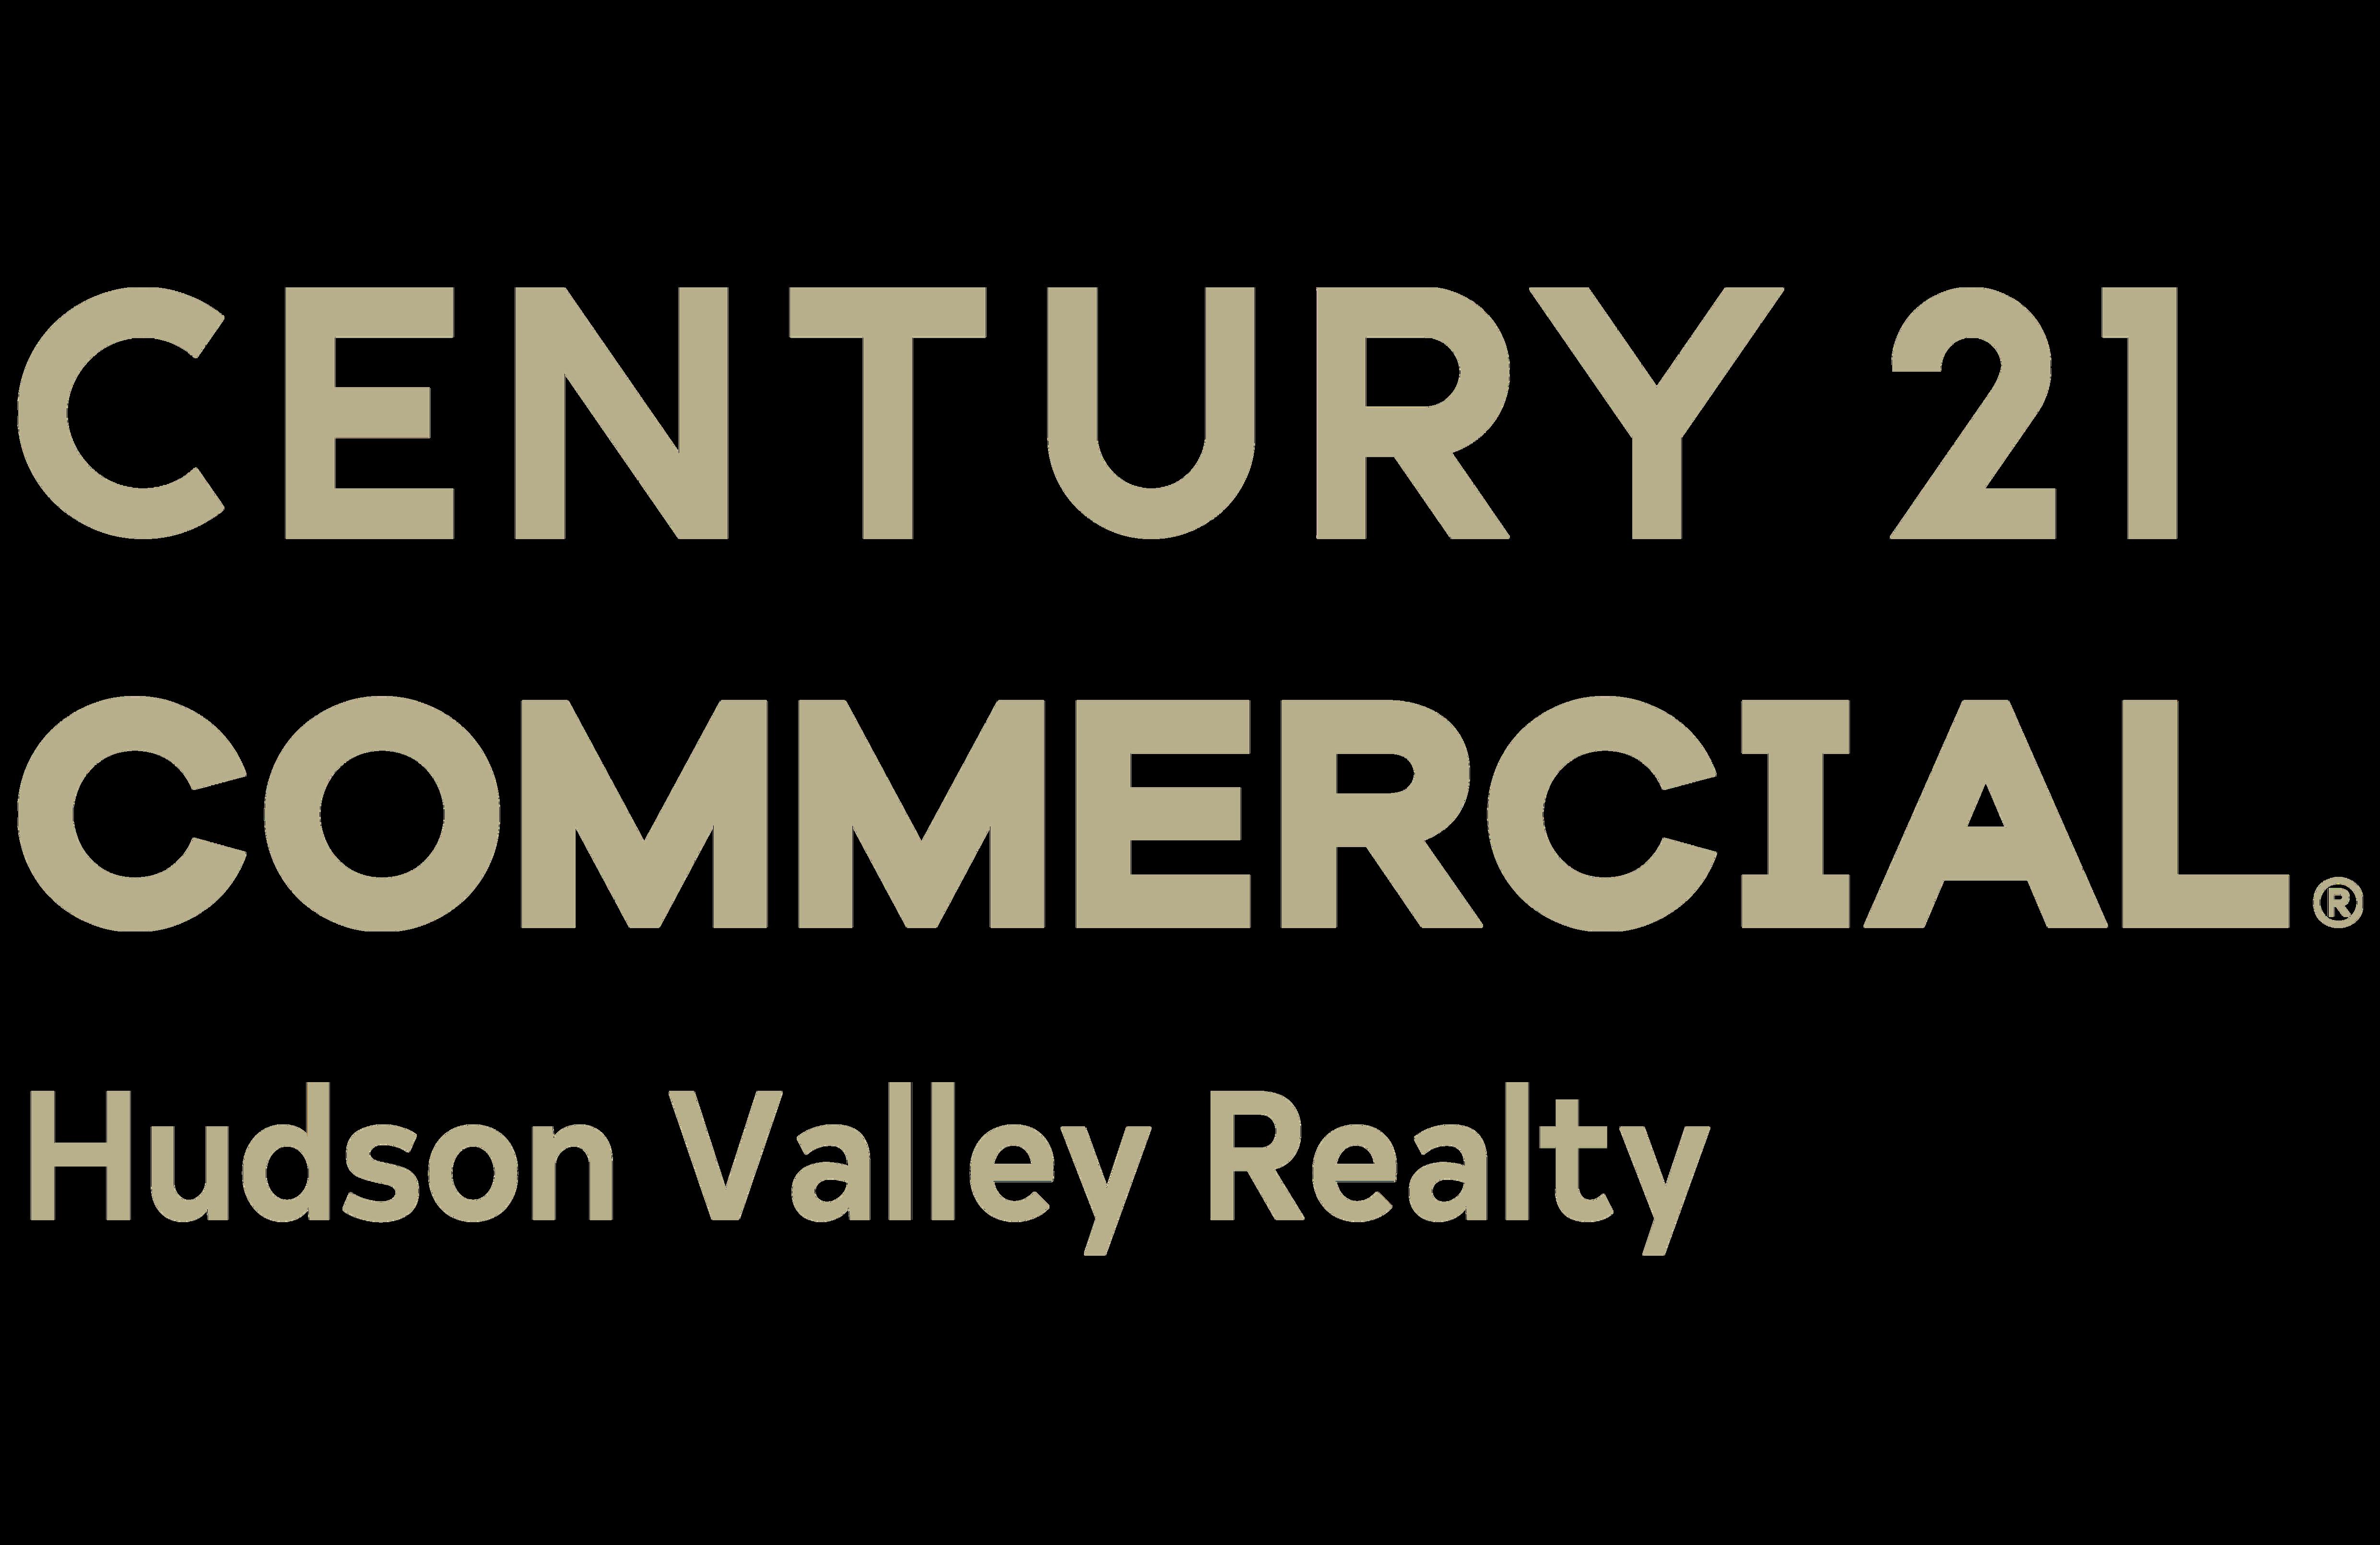 CENTURY 21 Hudson Valley Realty